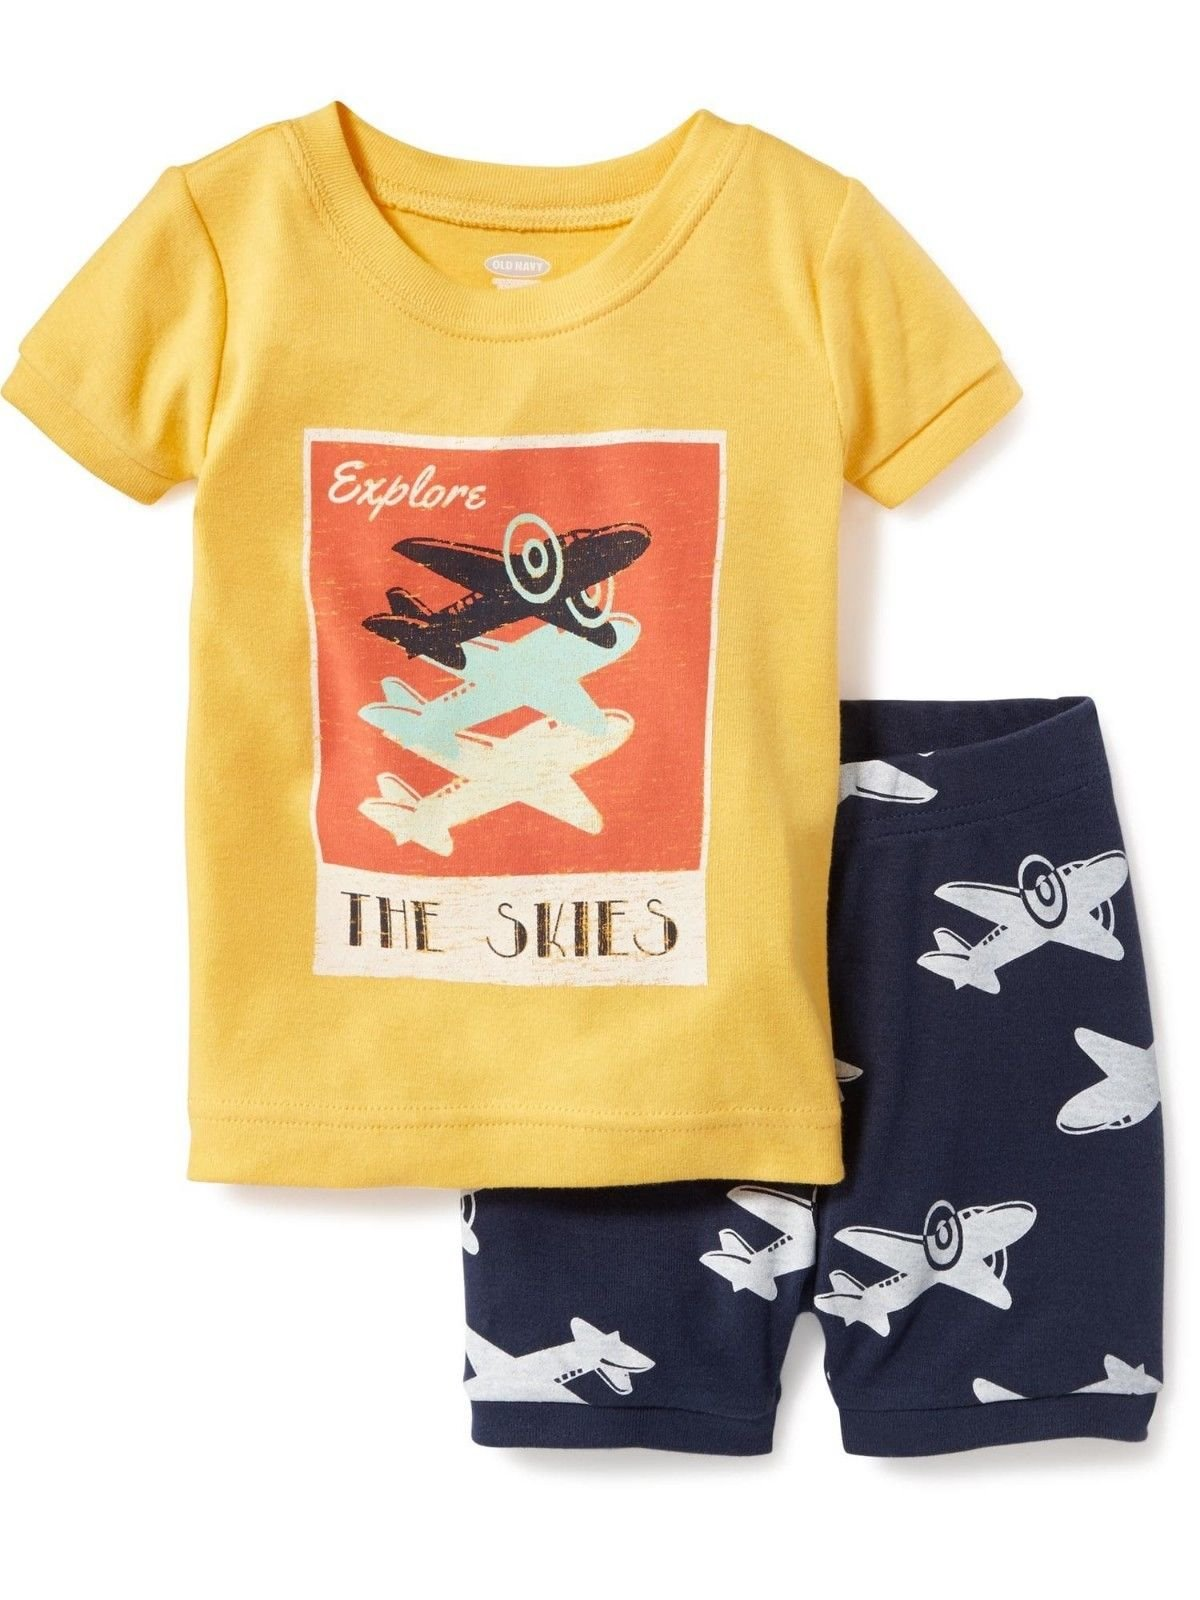 Toddler Boy's 5T Airplane Explore The Skies Pajama Shorts Set